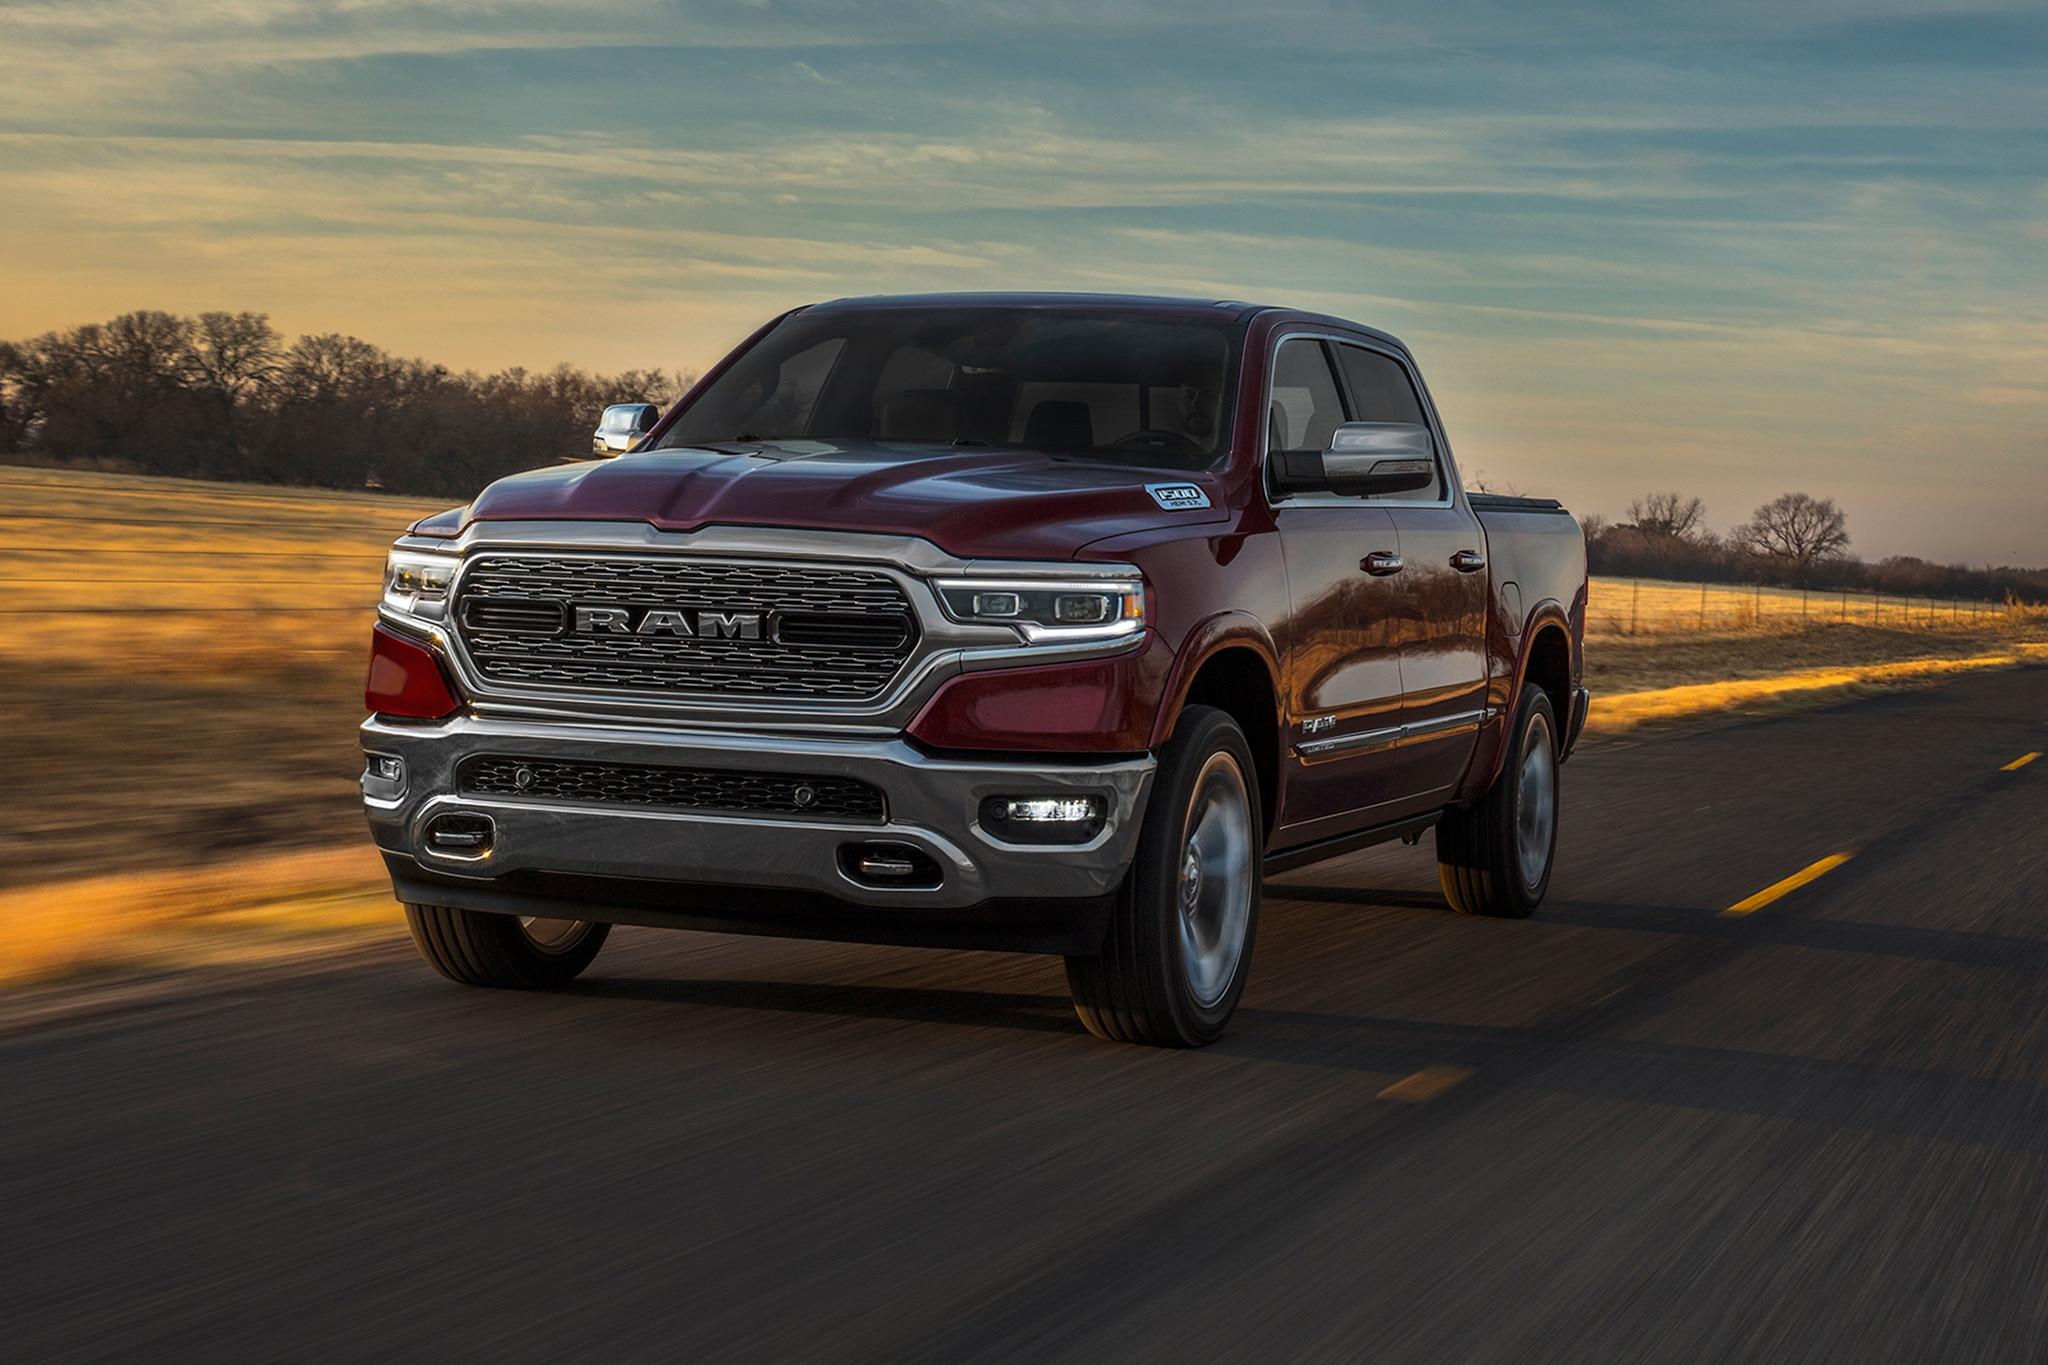 2019 Ram 1500 Kentucky Derby Truck Now Taking Bets ...